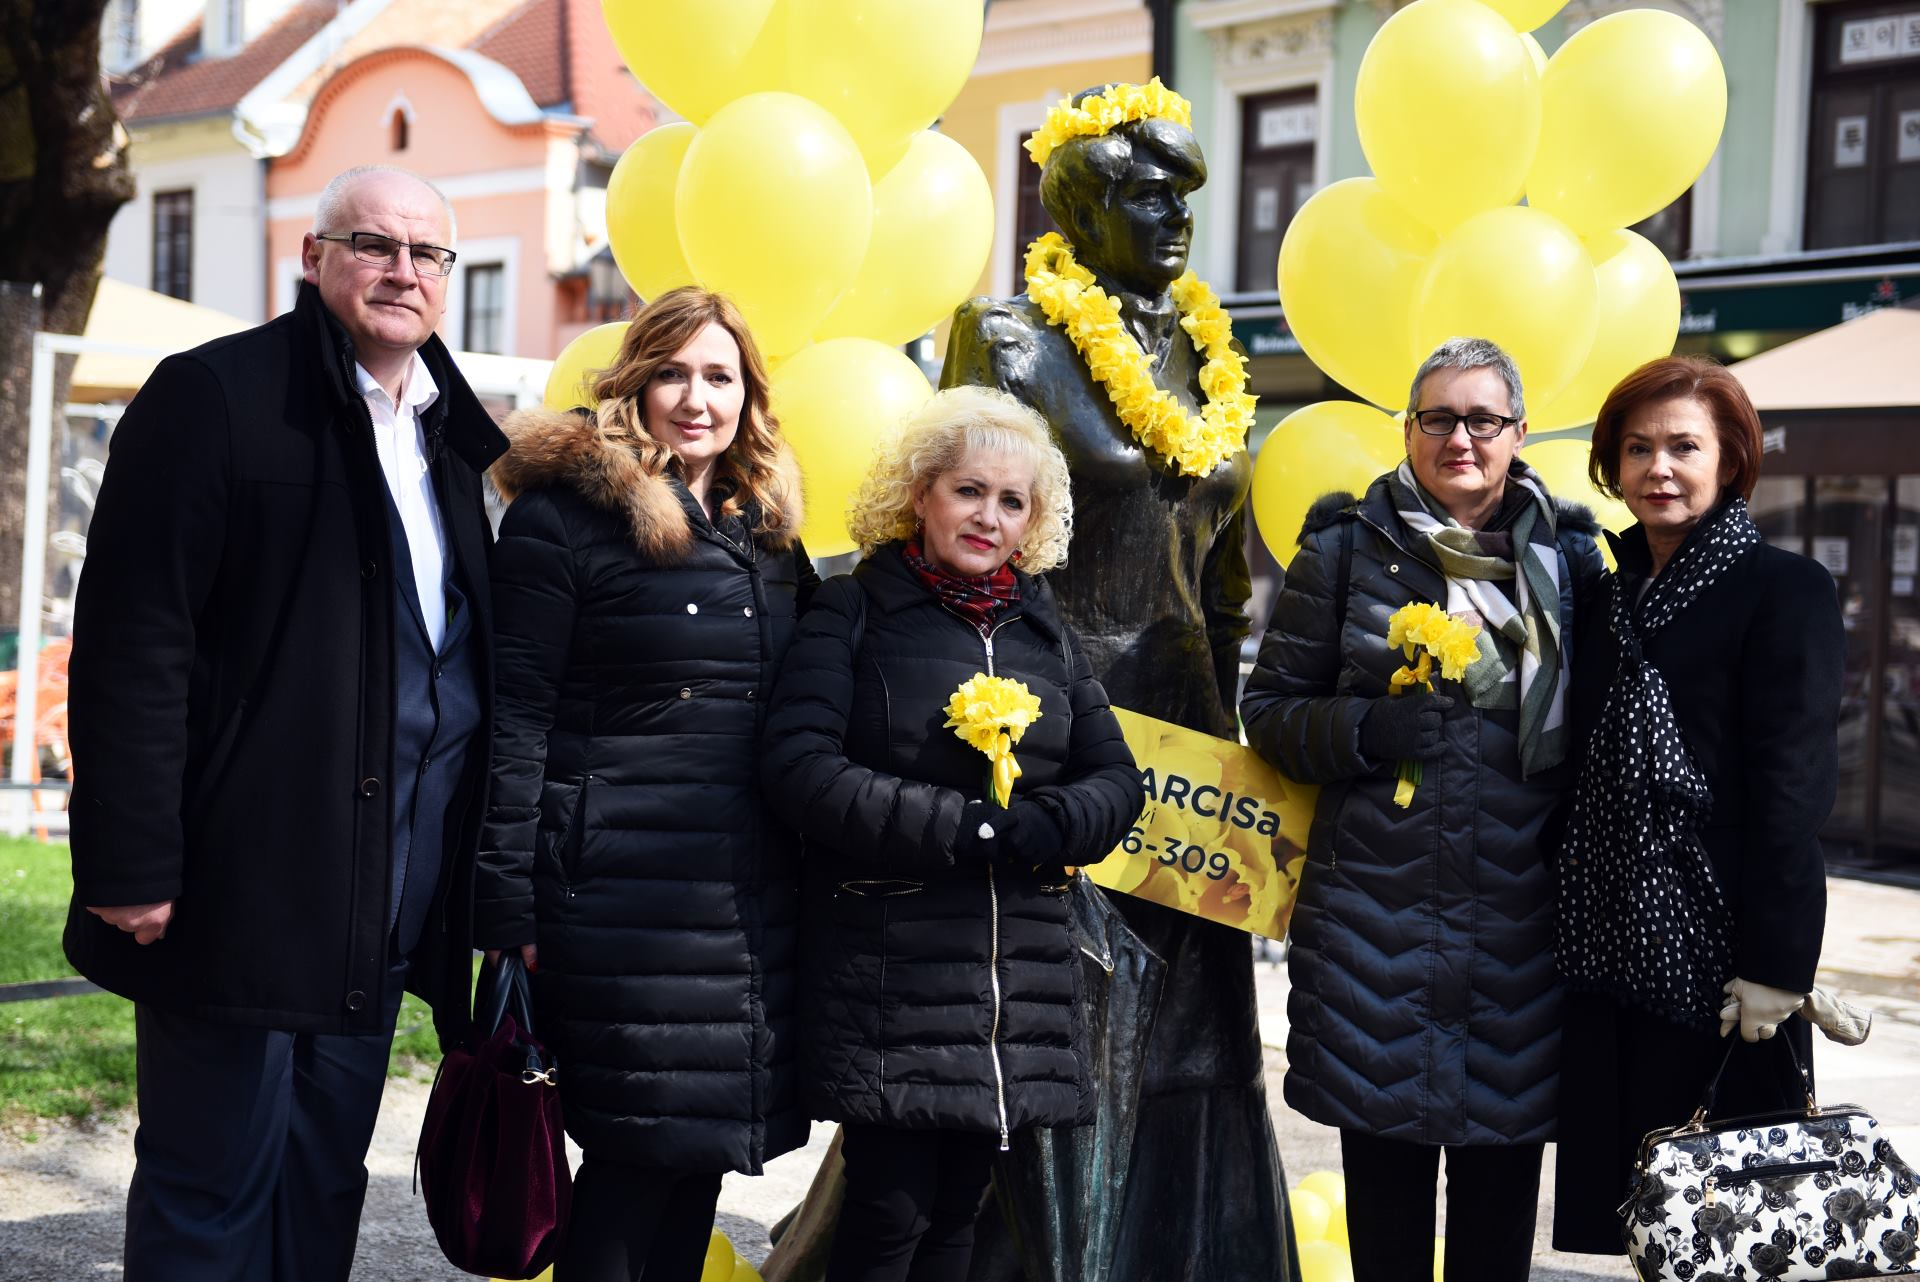 Krenule aktivnosti povodom obilježavanja Nacionalnog dana borbe protiv raka dojke